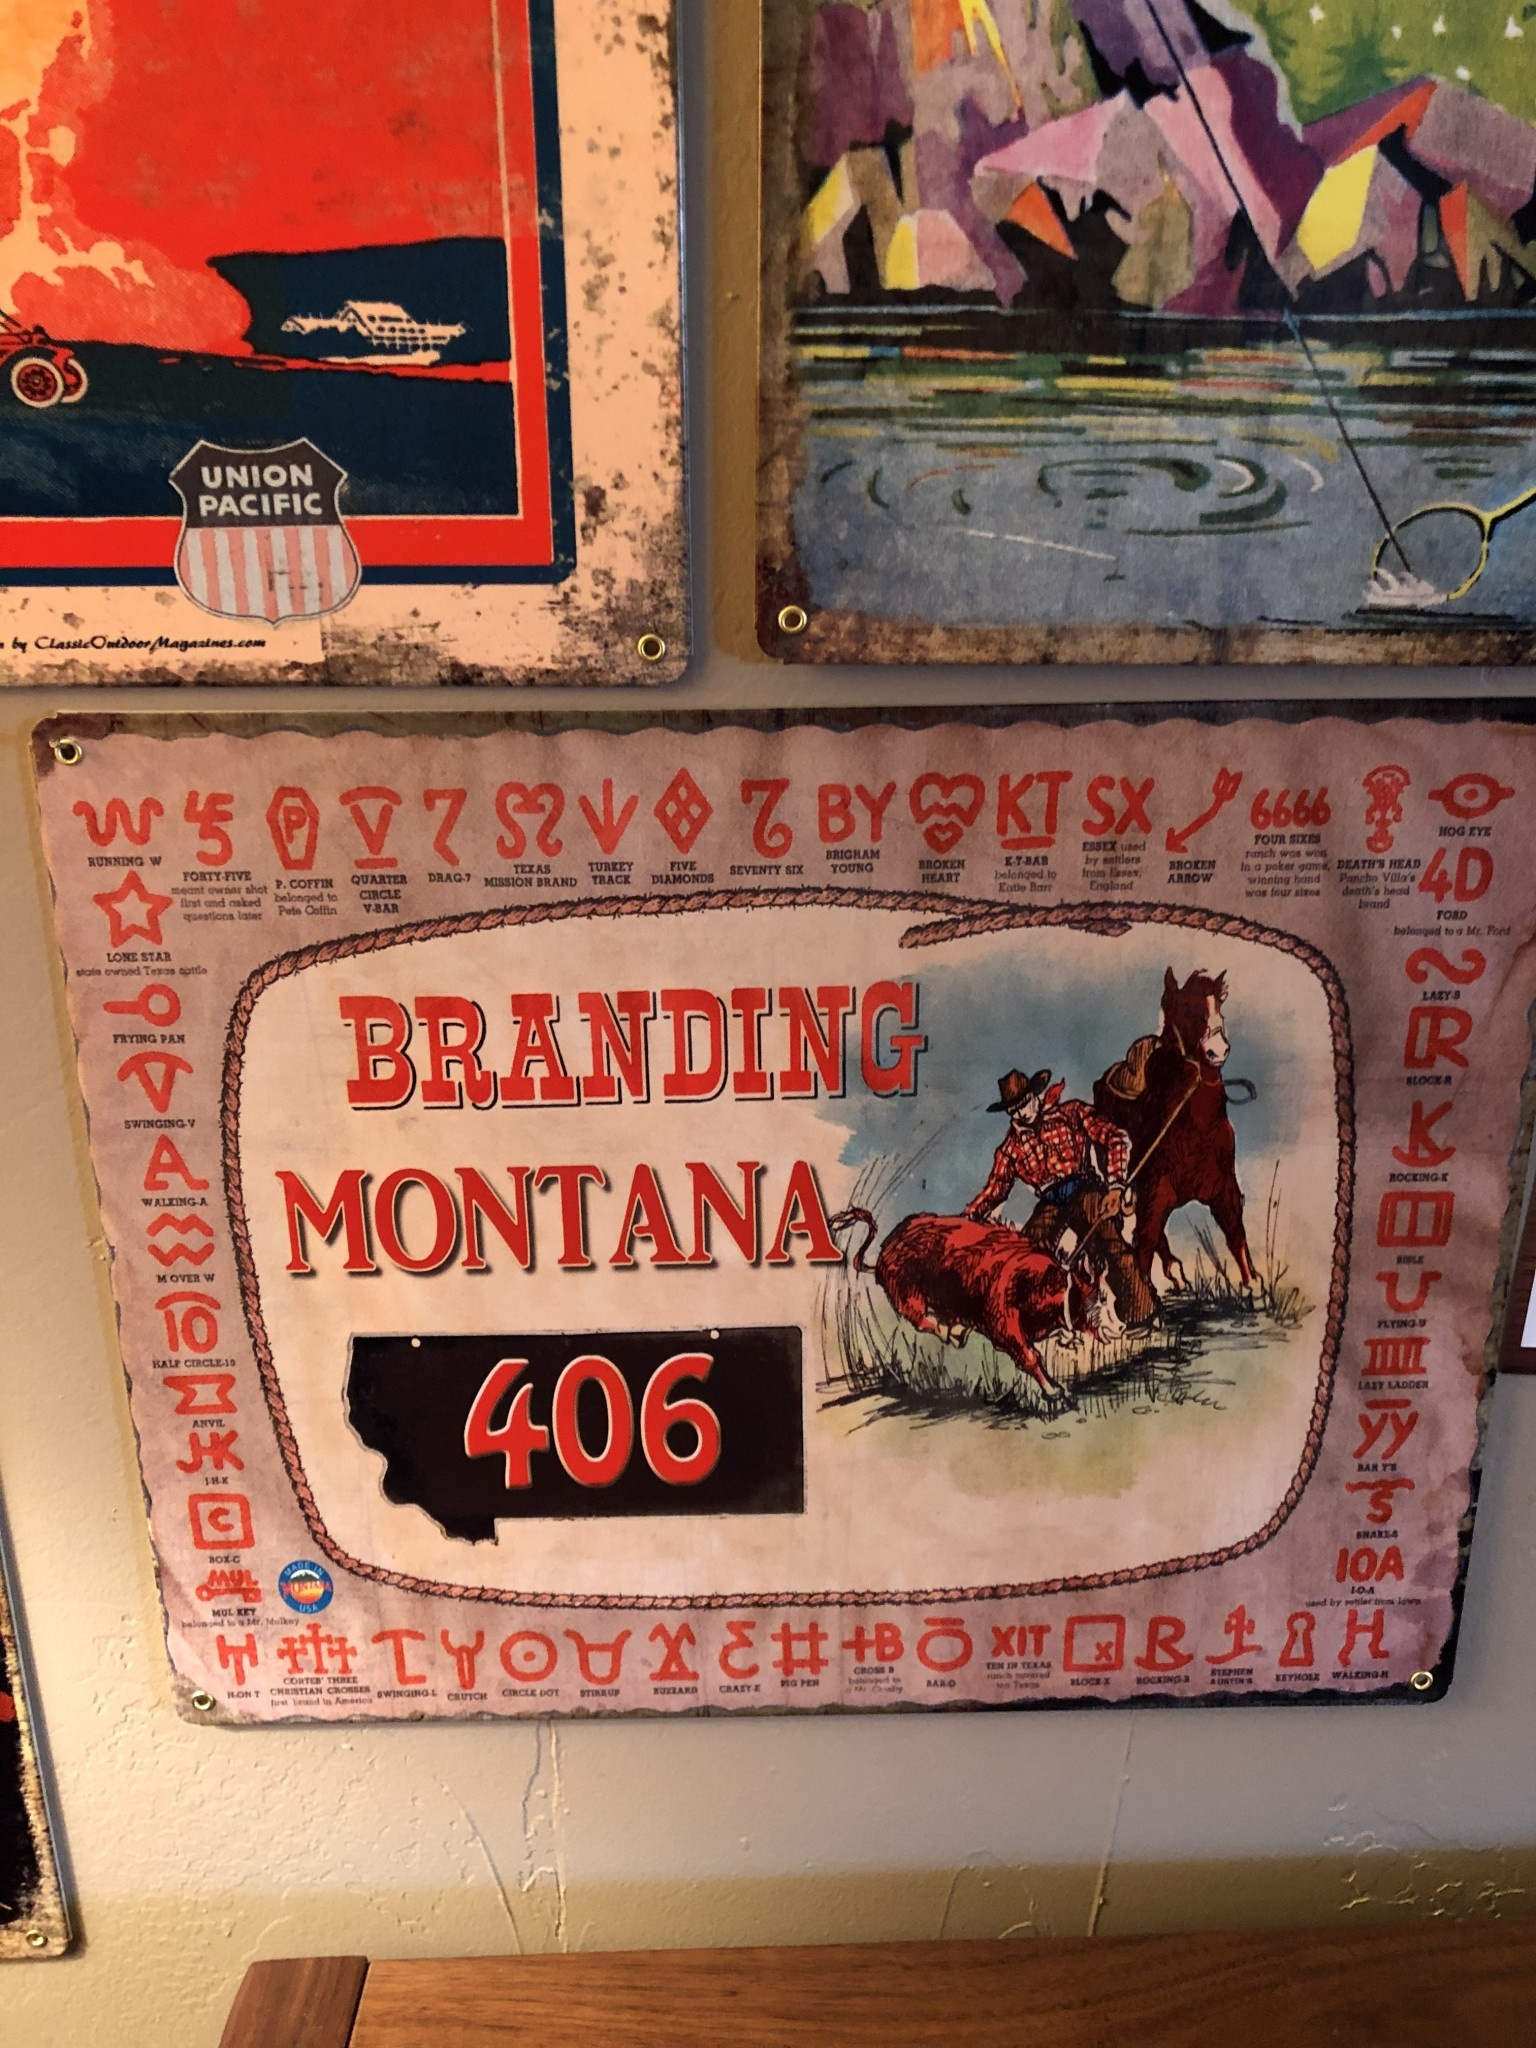 Classic Outdoor Magazines #18  Branding Montana 12x15 Metal Sign